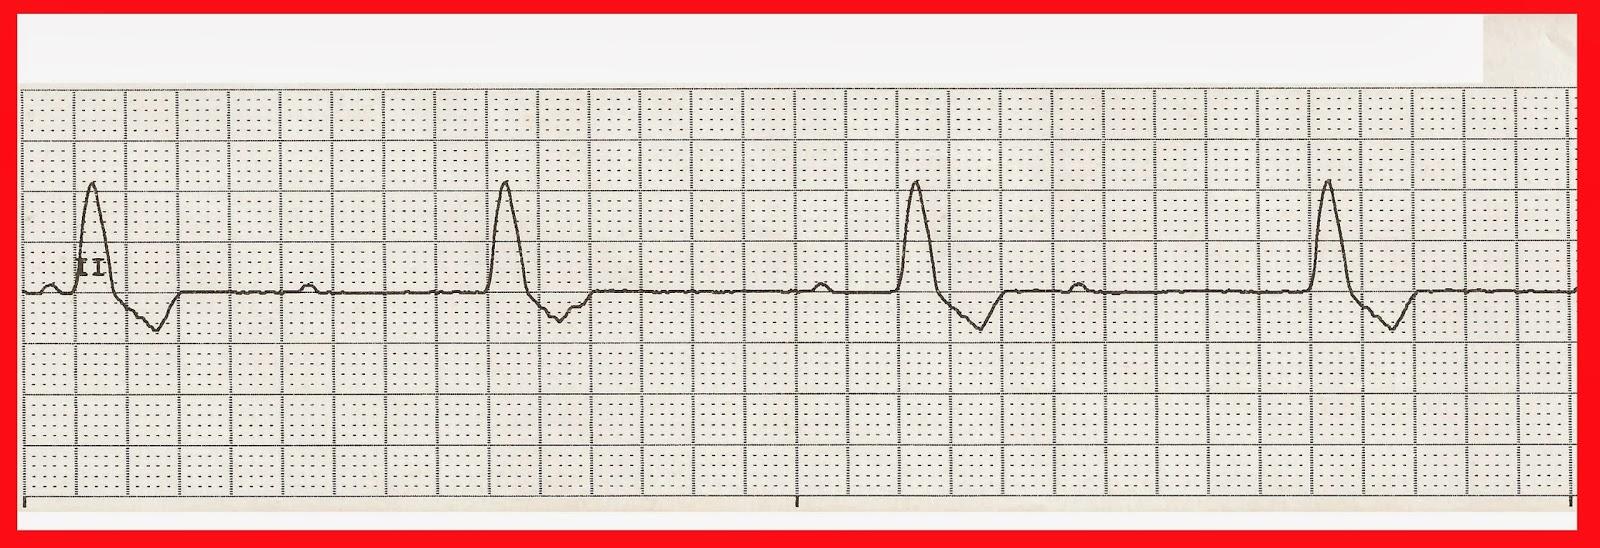 Float Nurse Practice EKG Rhythm Strips 216